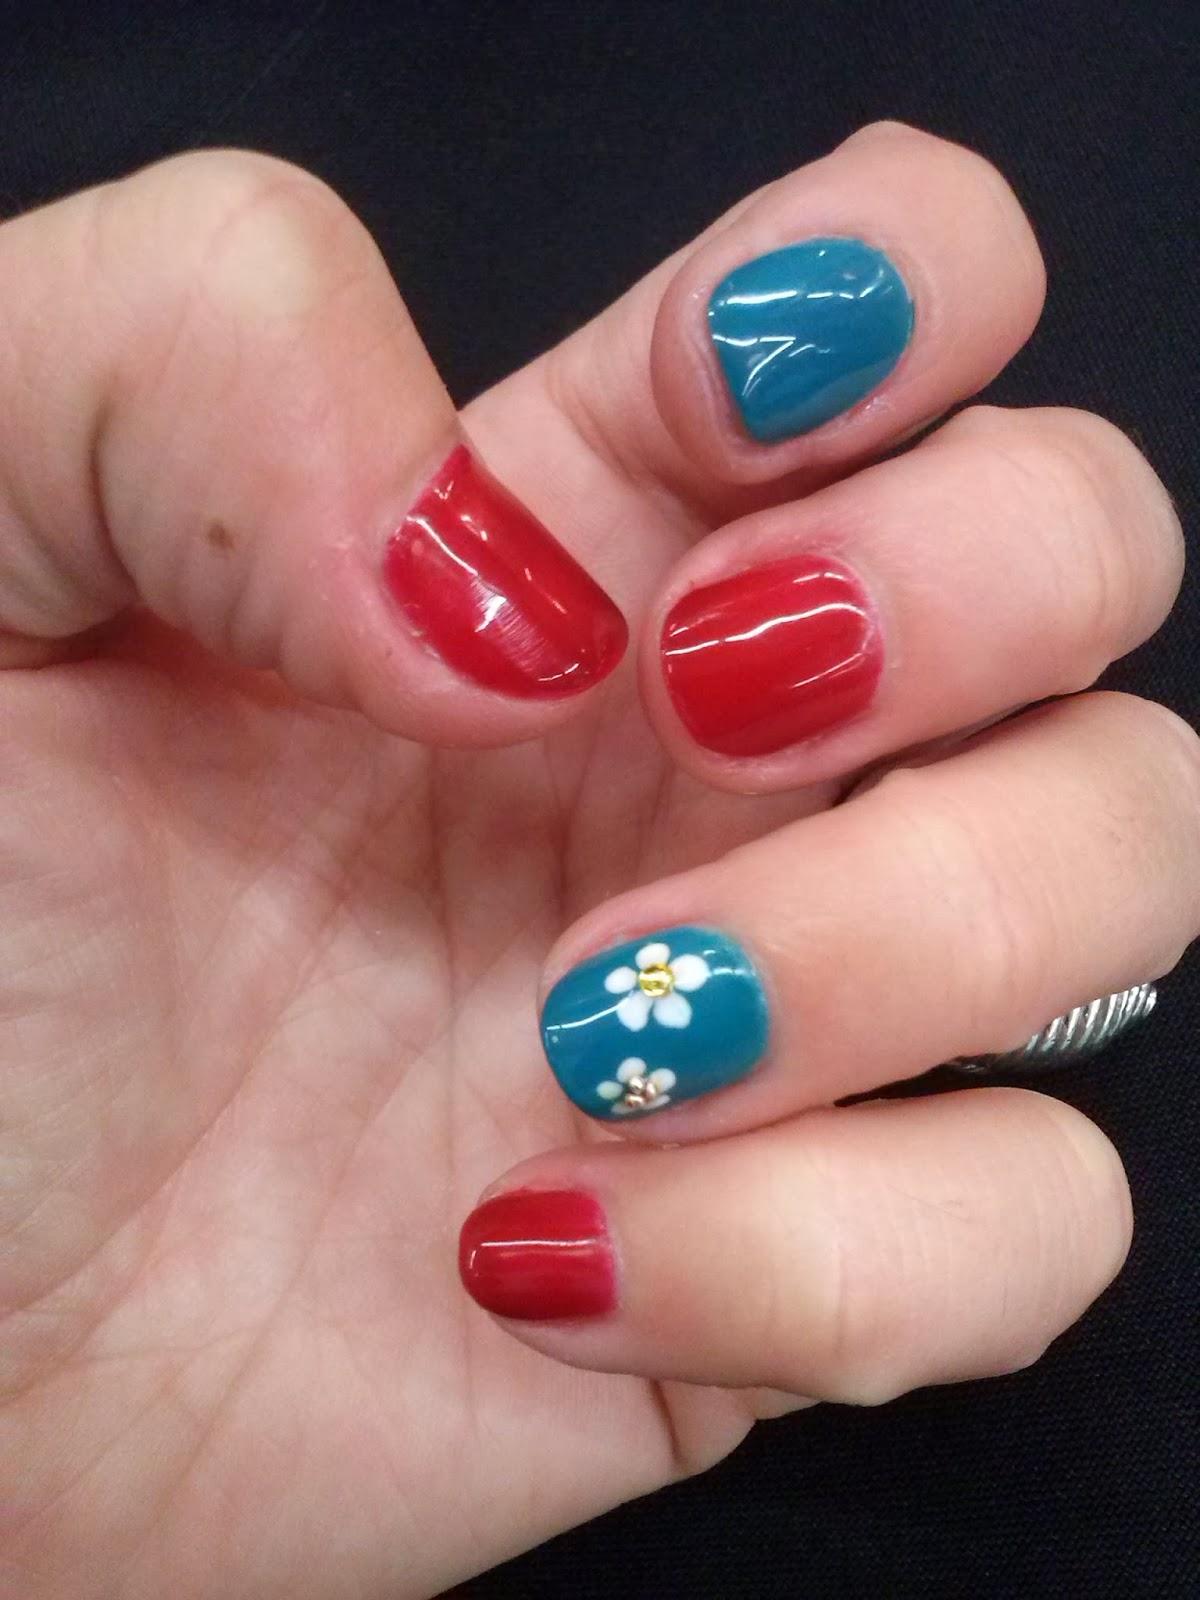 UÑAS CON FLORES | Mira mis uñas